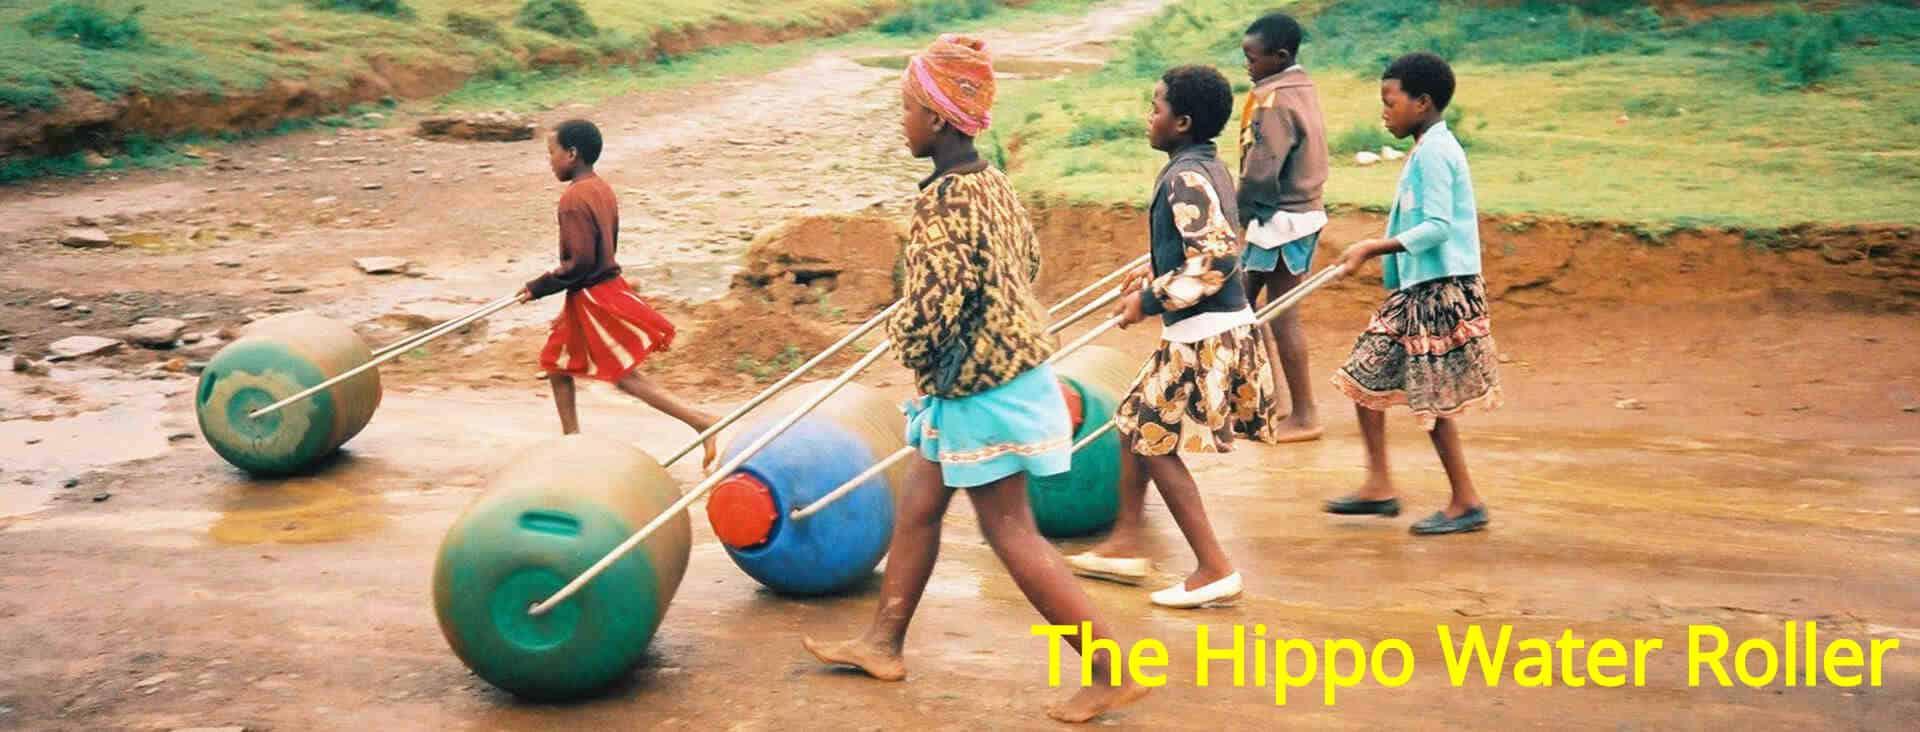 Hippo Water Roller: This Wheelbarrow is not a Wheelbarrow